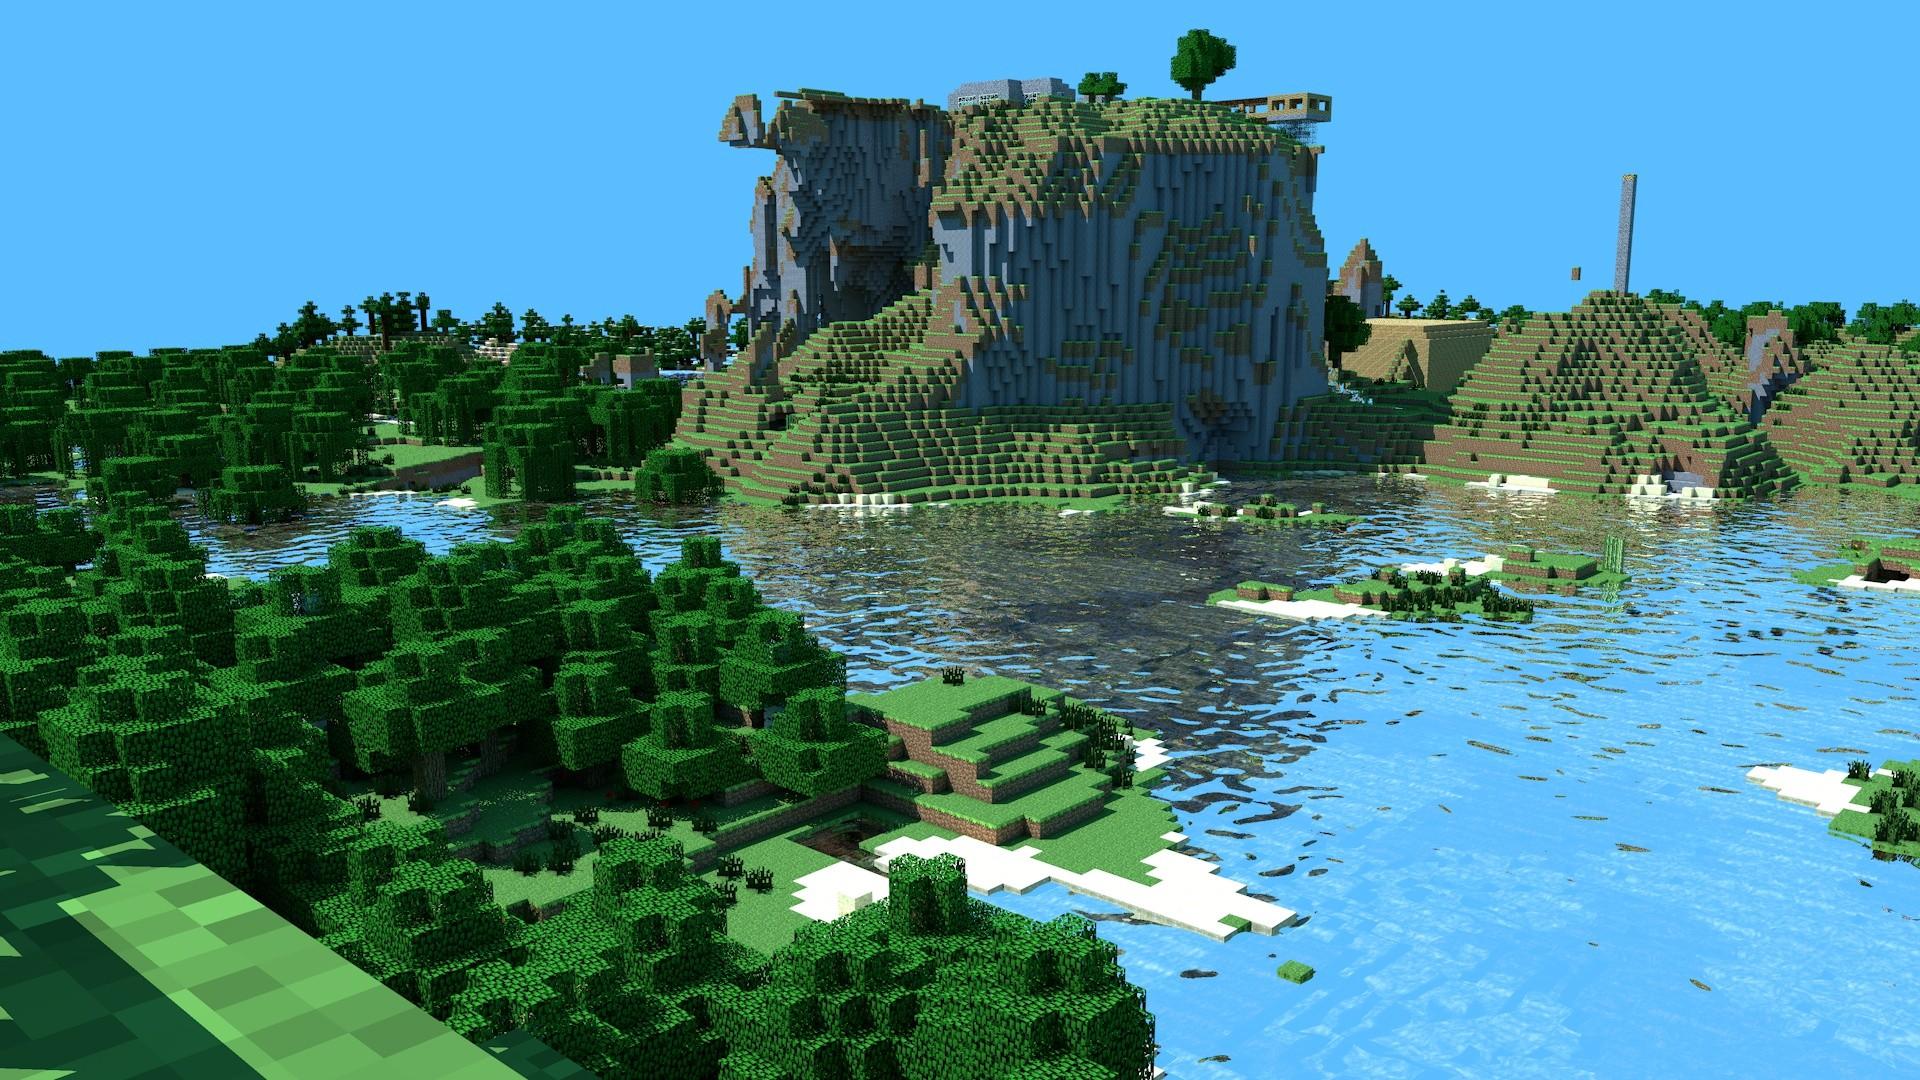 Minecraft Wallpaper 46609 1920x1080px 1920x1080